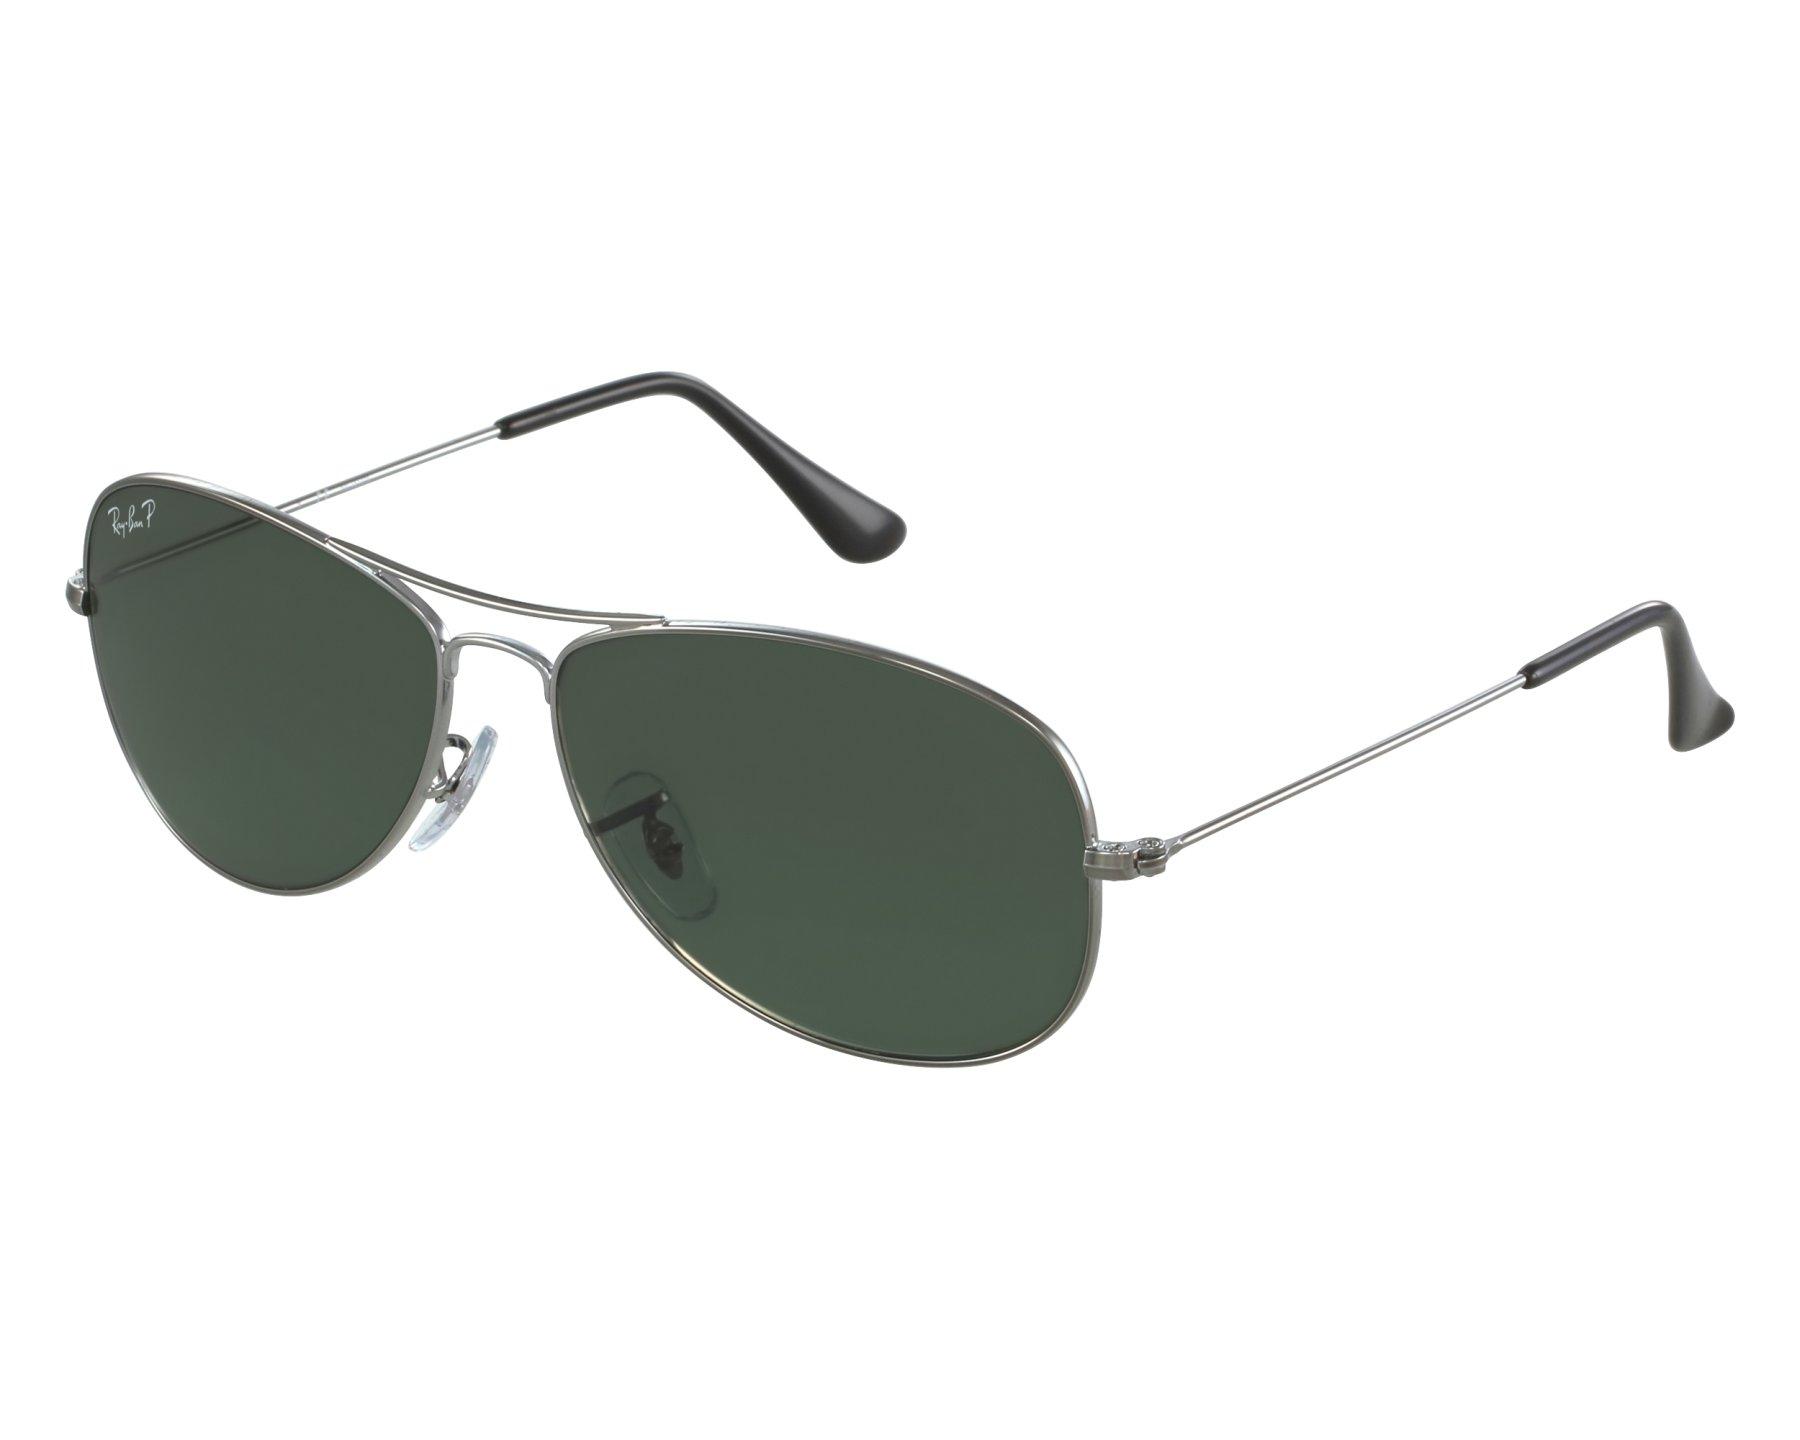 Sunglasses Ray-Ban RB-3362 004 58 59-14 Gun front view 92803b6da6c